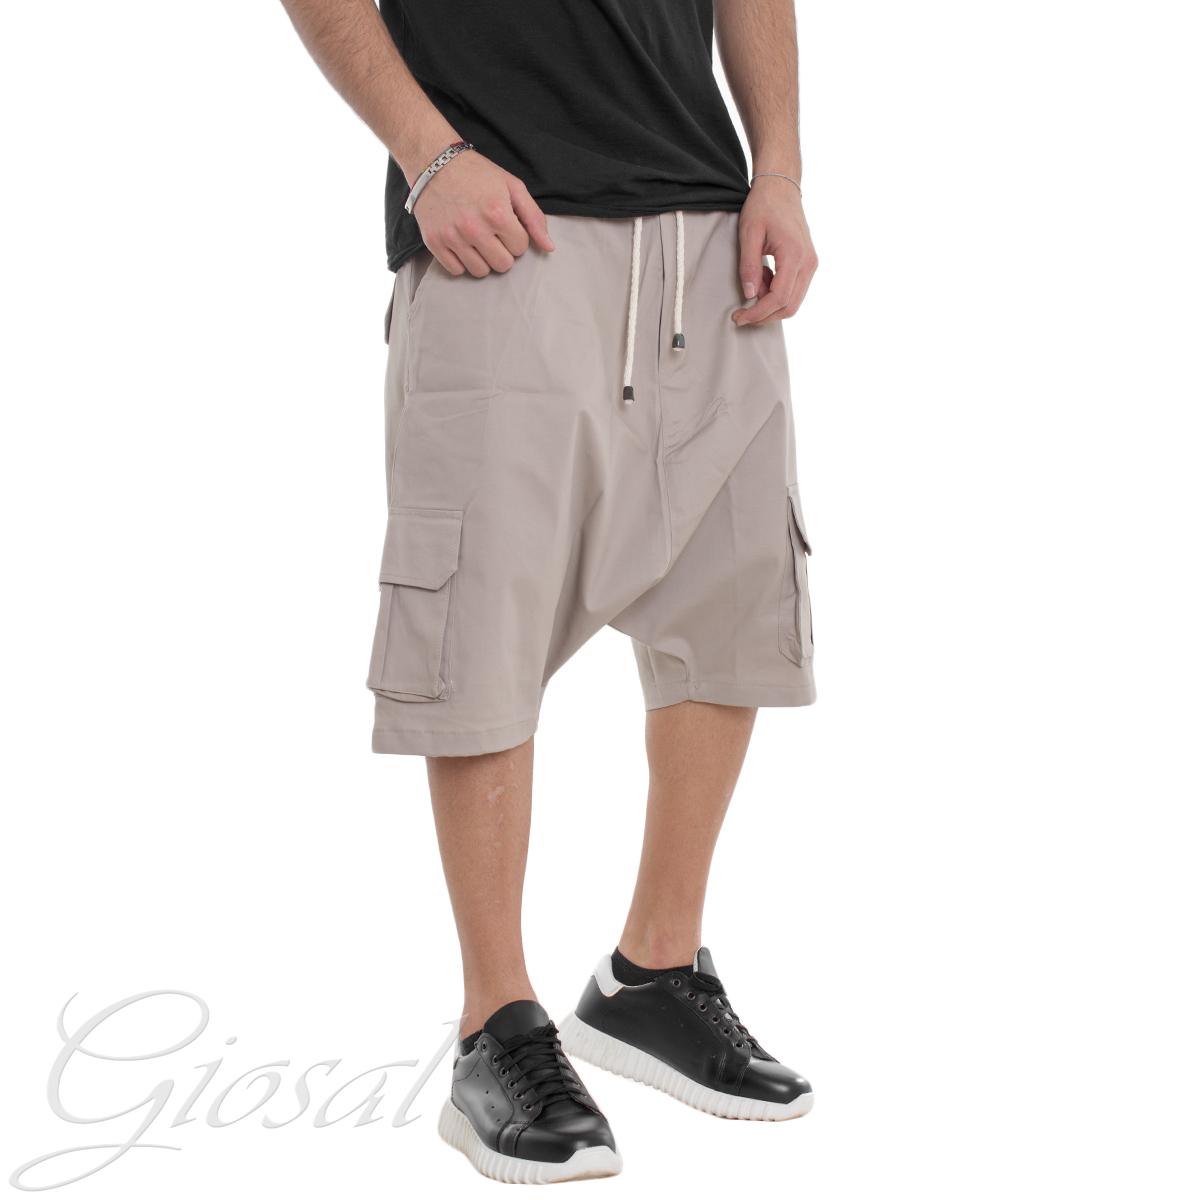 Pantalone-Uomo-Corto-Bermuda-Cavallo-Basso-Tinta-Unita-Vari-Colori-Casual-GIOSAL miniatura 14